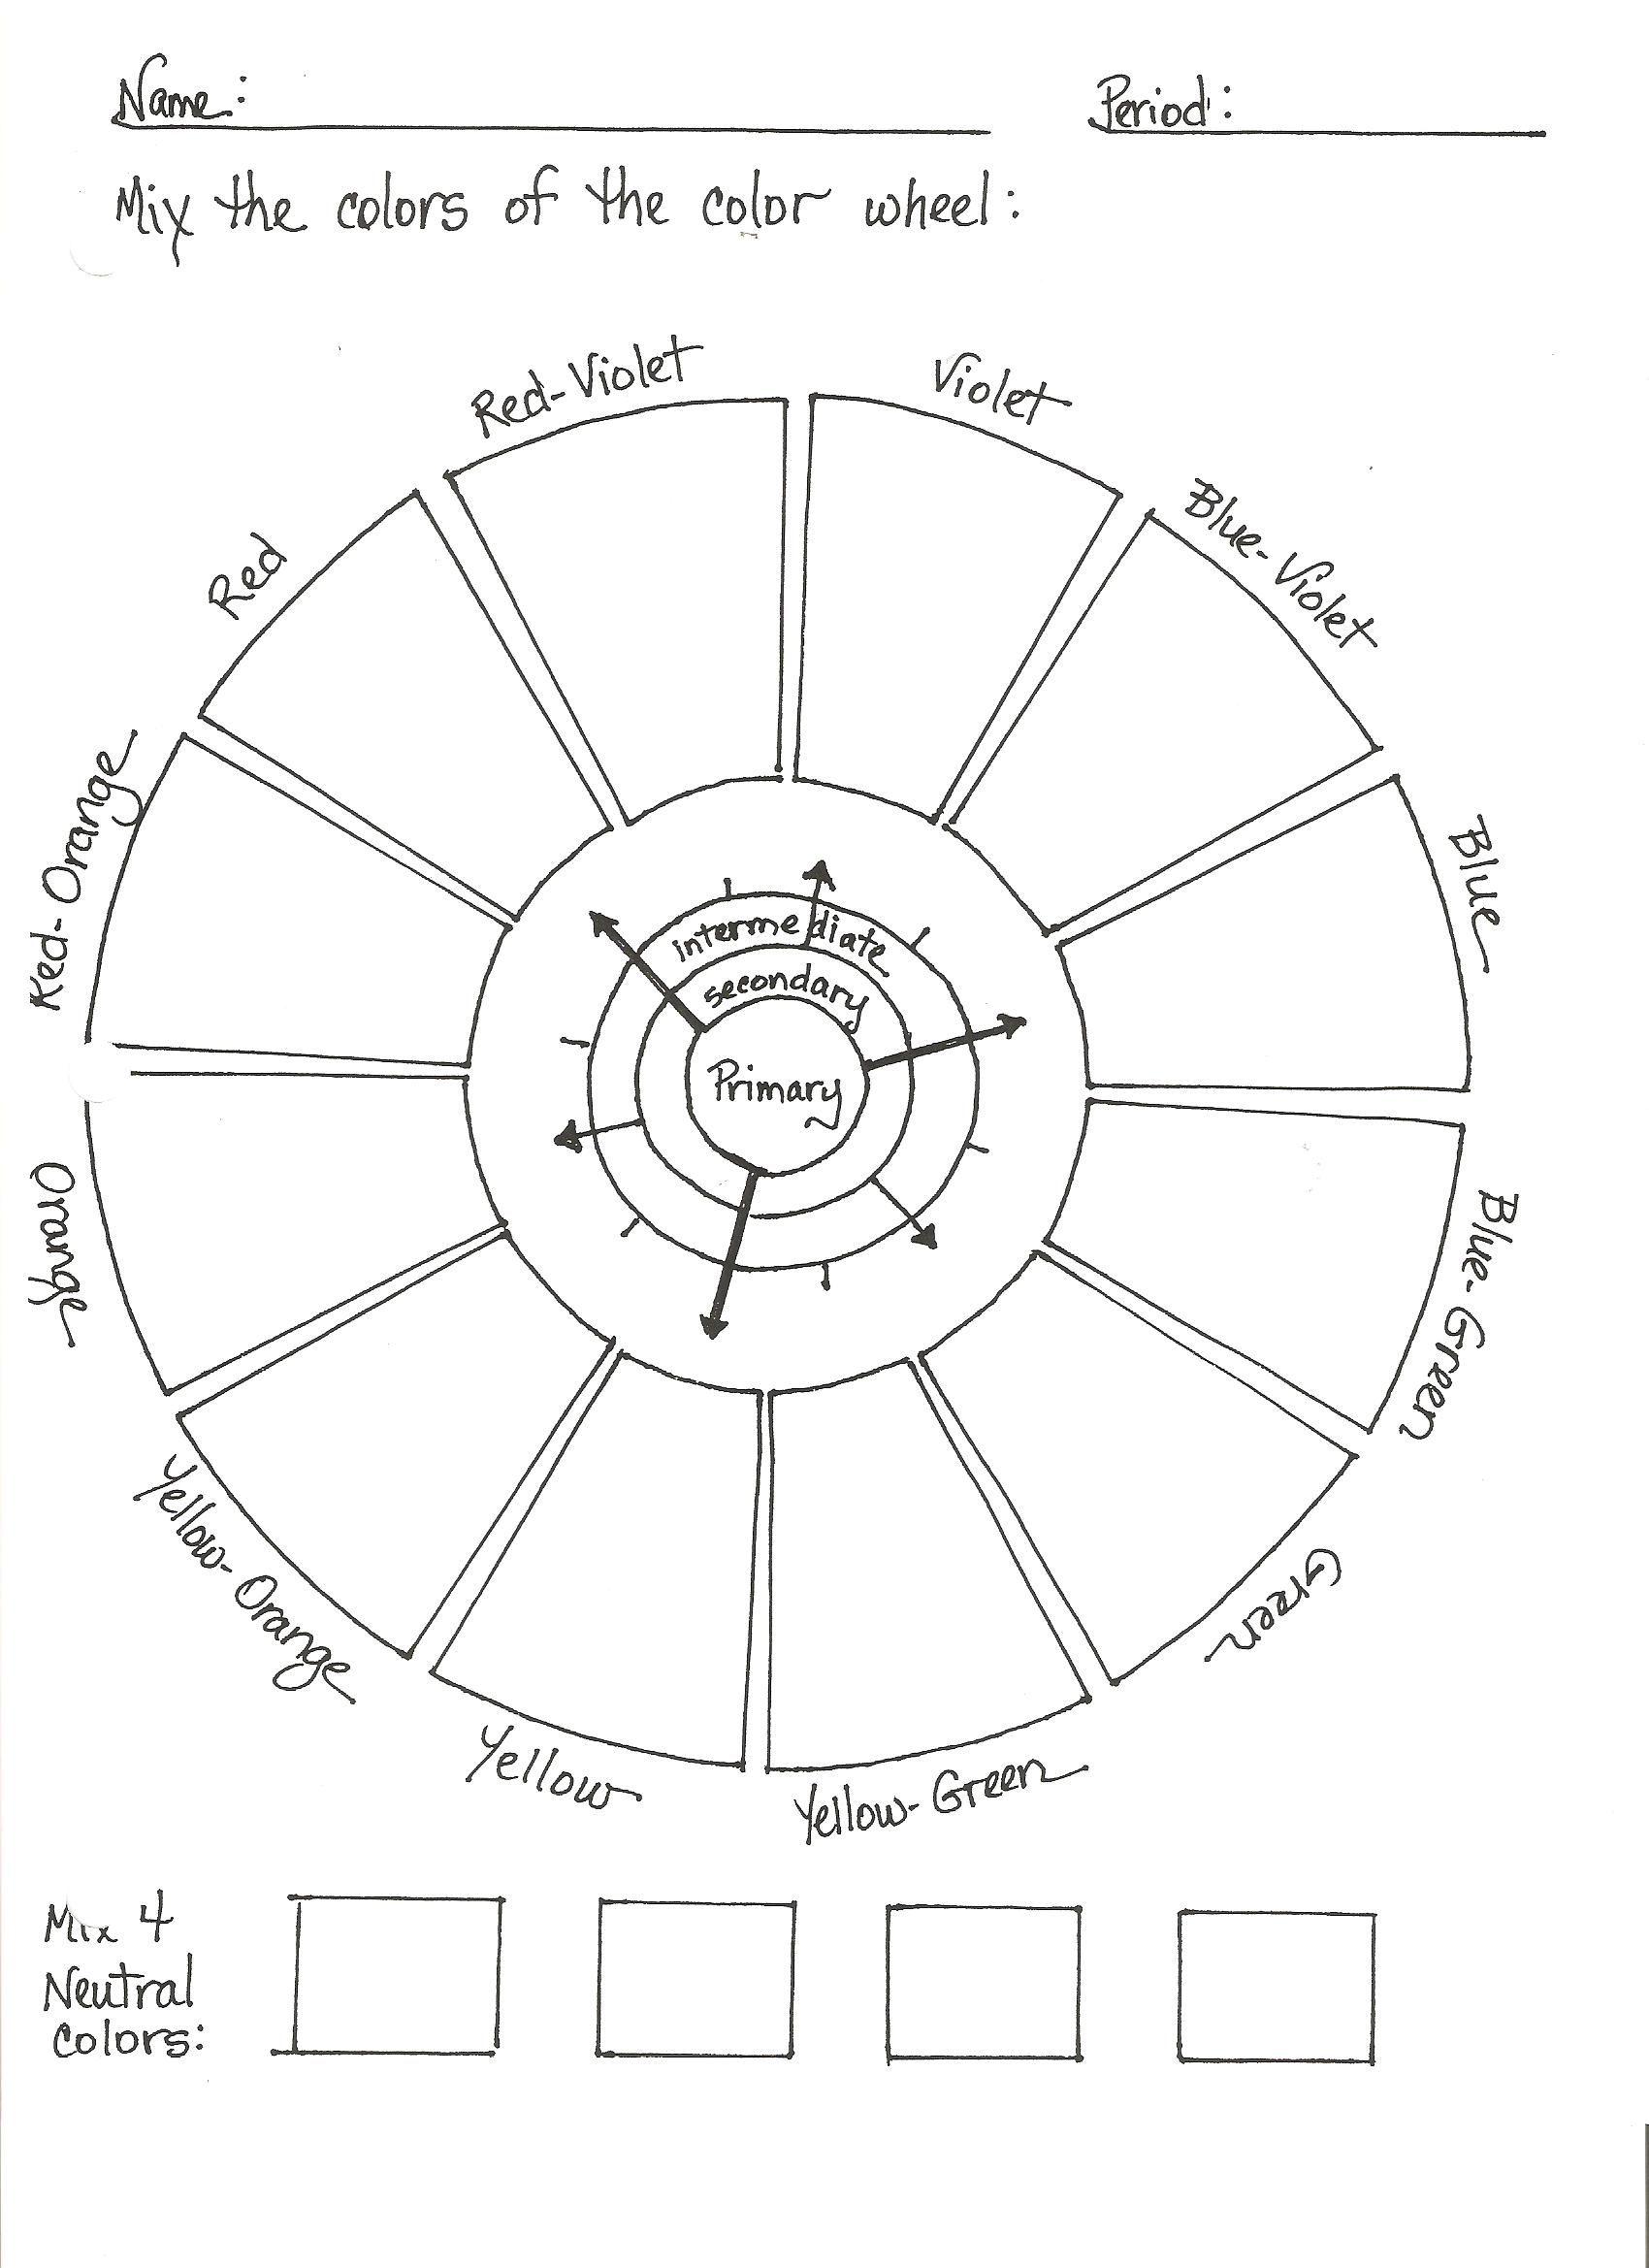 Worksheets Color Wheel Worksheet high school color wheel worksheet invitation templates teaching templates